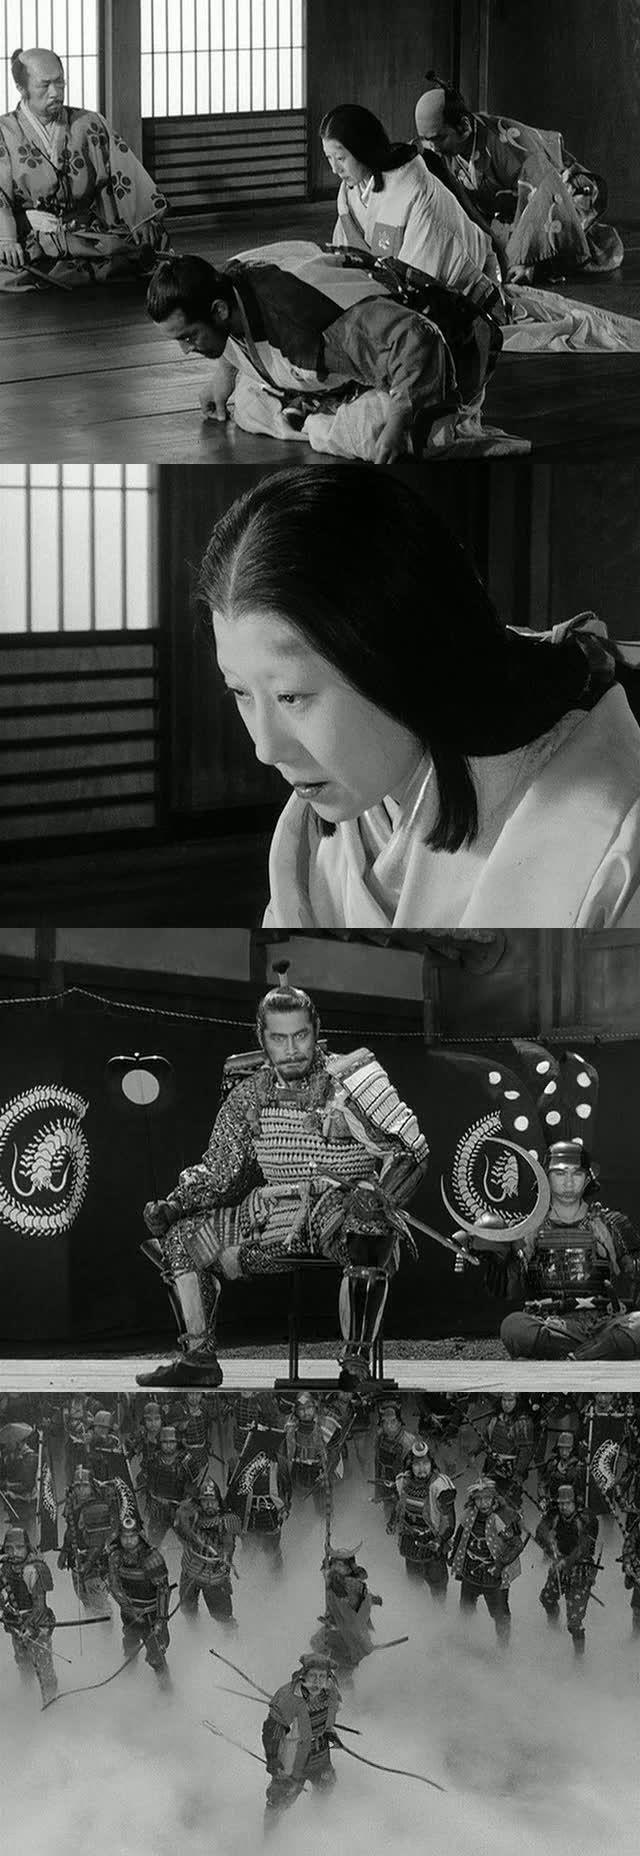 Kumonosu-jô (Throne of Blood), 1957 (dir. Akira Kurosawa)